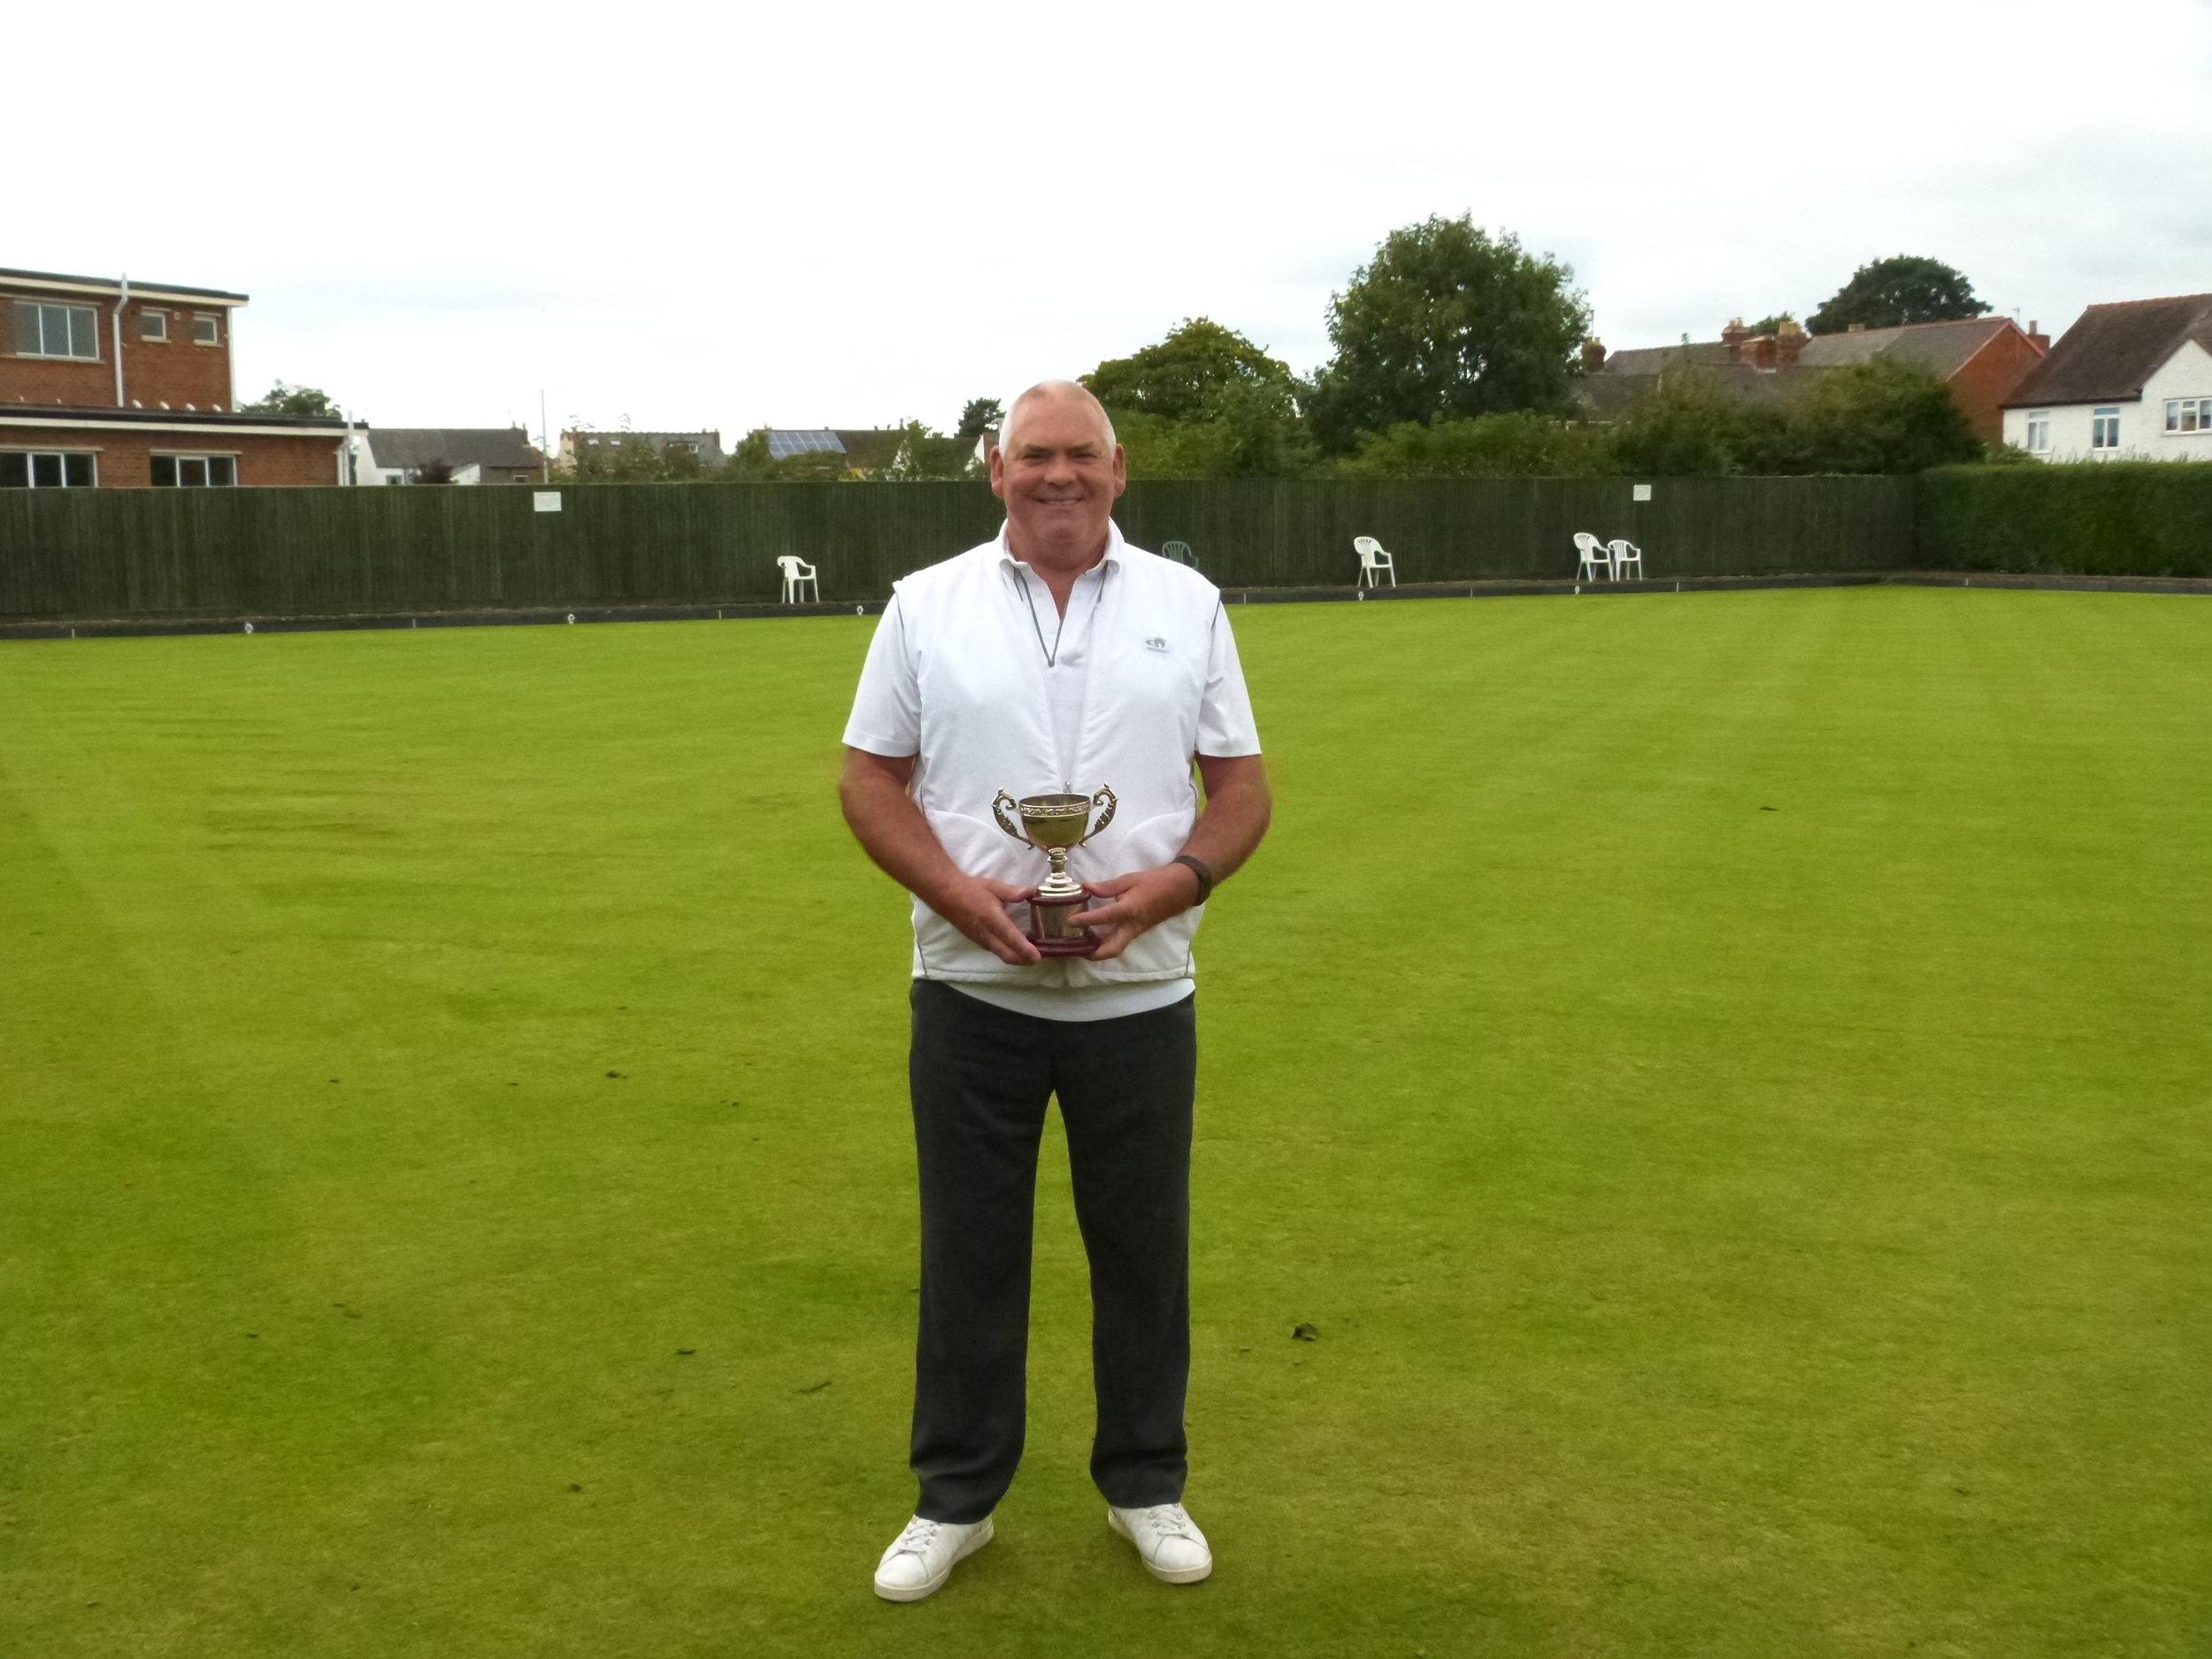 ANDY ANDREWS MEMORIAL CUP   Winner - Chris Gardner  Runner Up - Charles Wallace